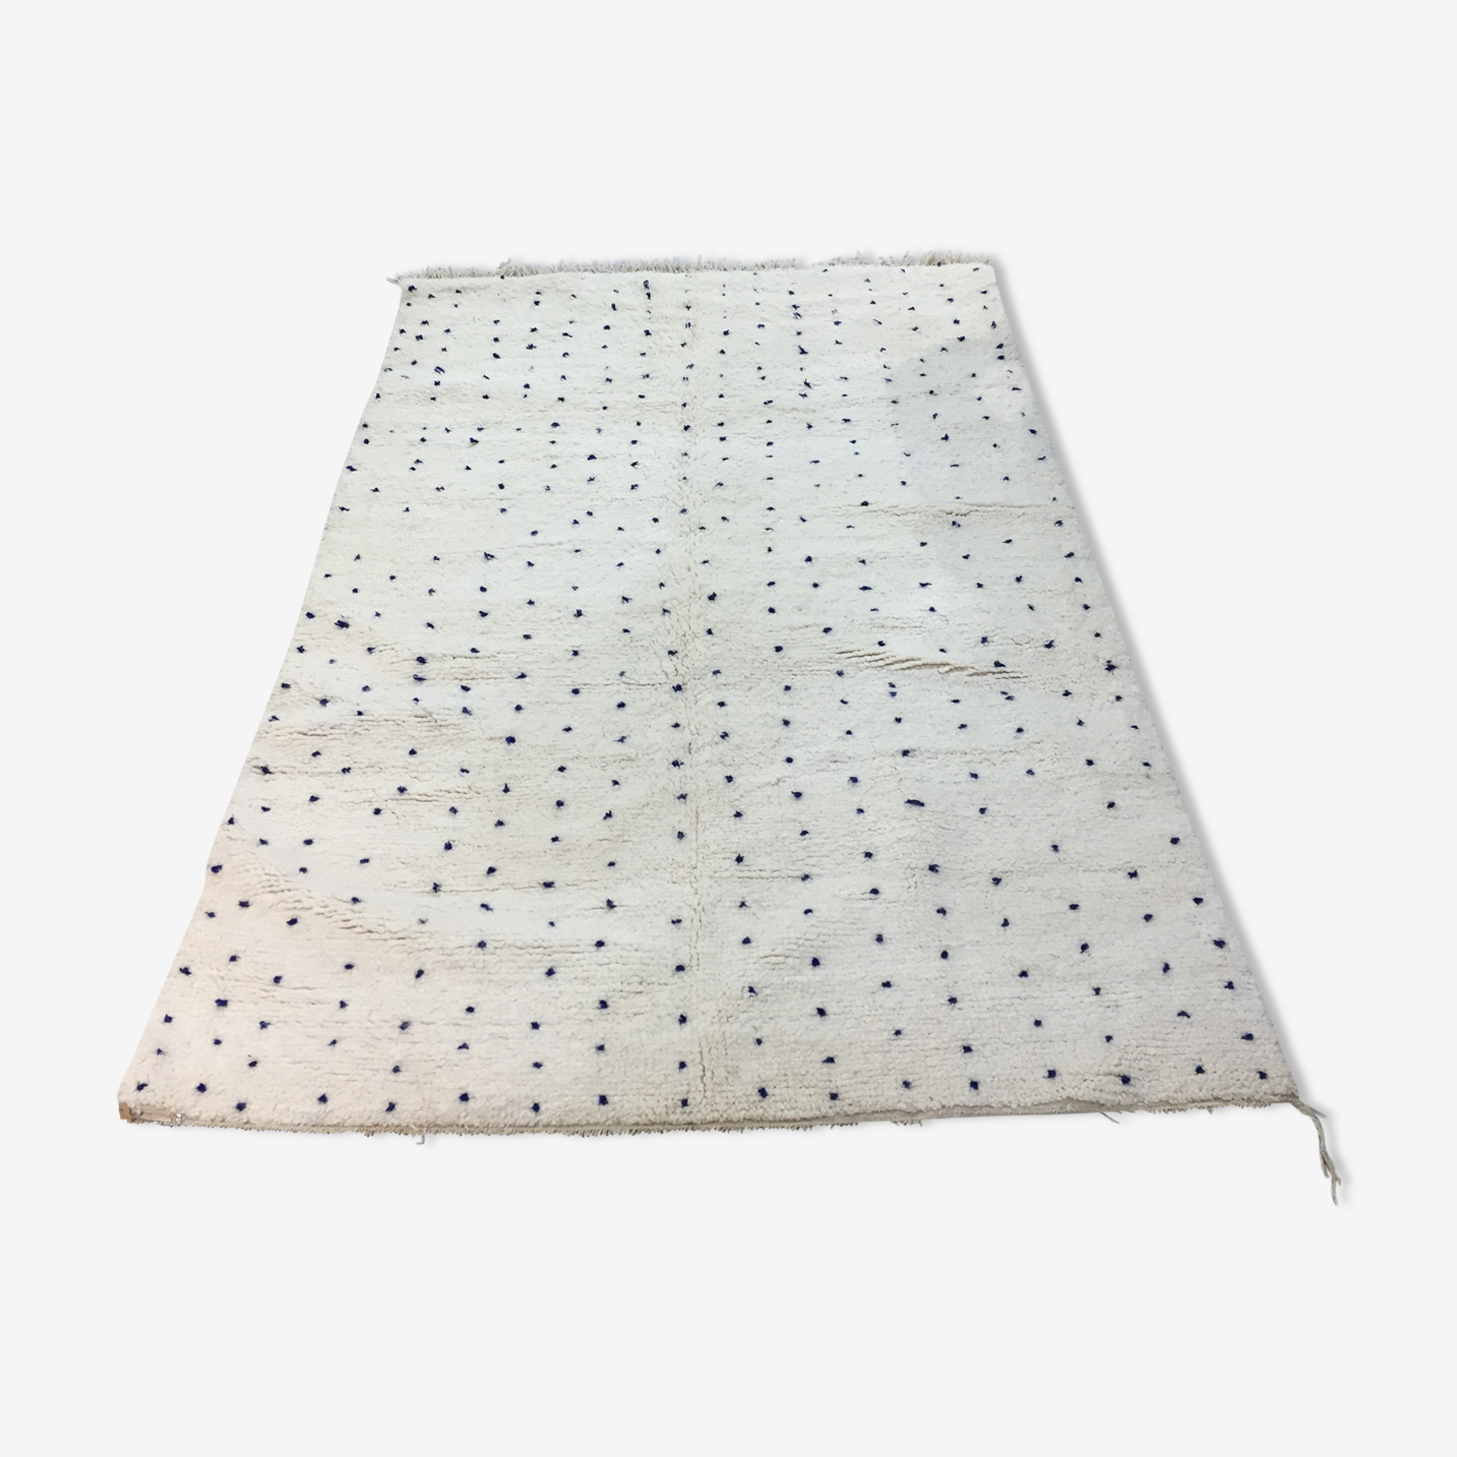 Blessed carpet ouarain blue polka dot 245 x 165